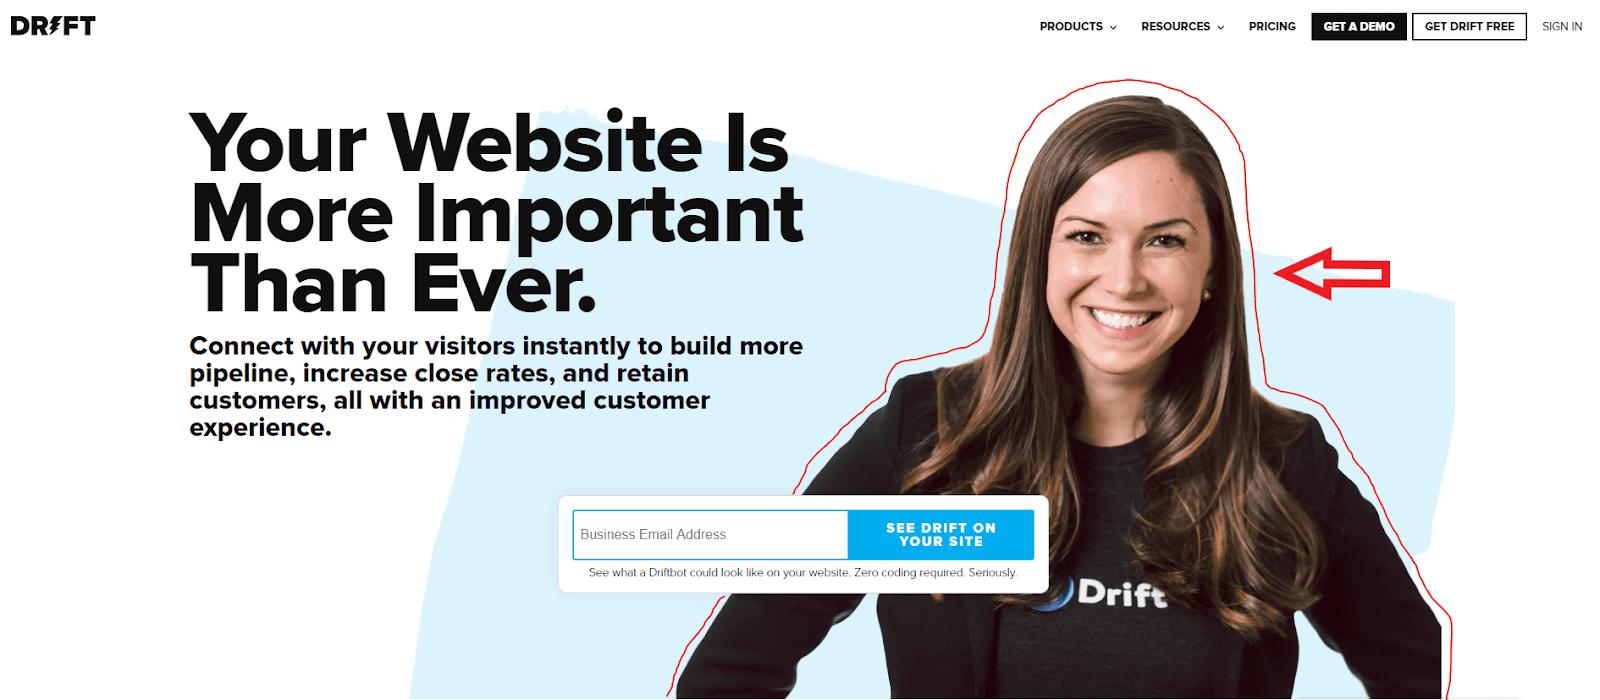 Drift Head of Customer Relations